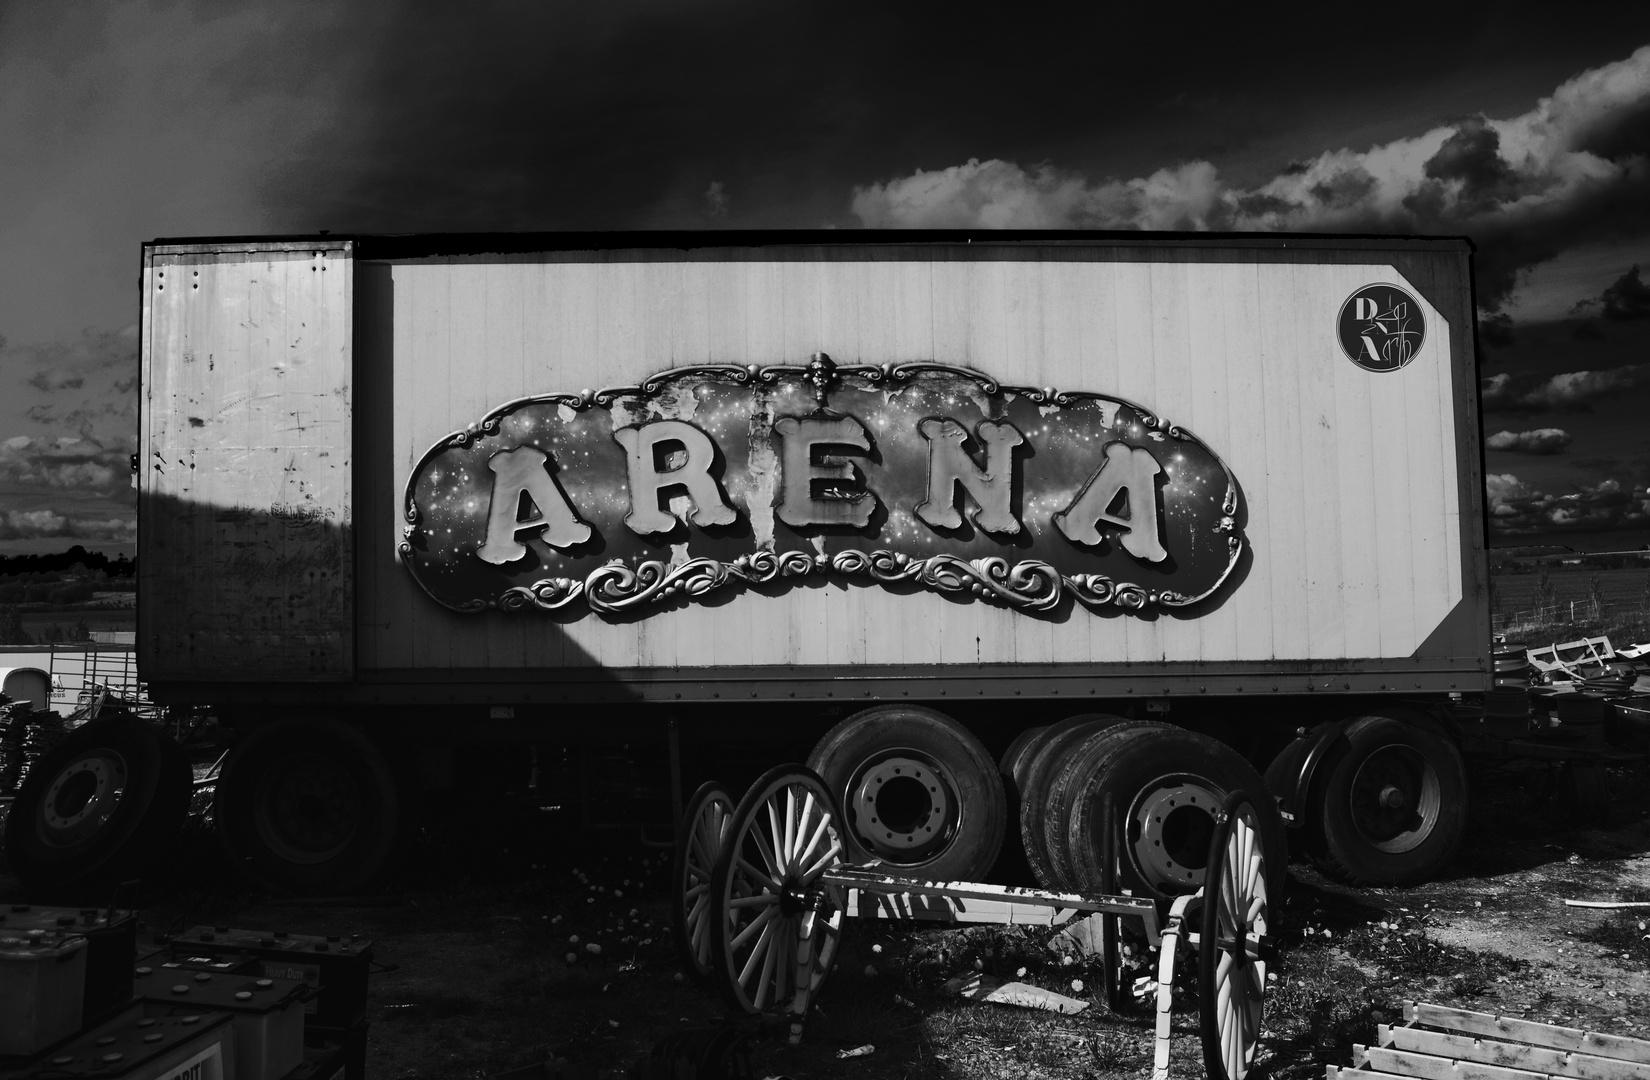 Circu.Arena.old